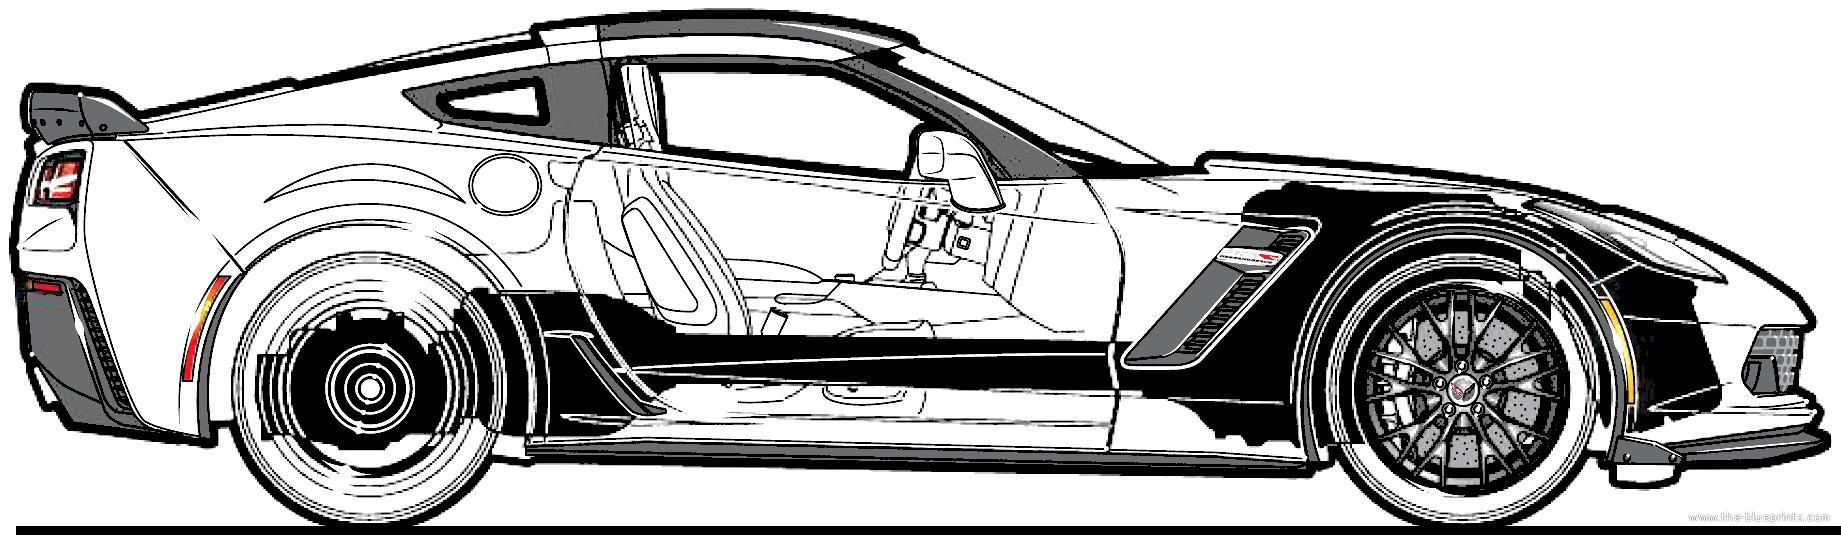 The blueprints blueprints cars chevrolet chevrolet chevrolet corvette c7 zo6 2015 malvernweather Images